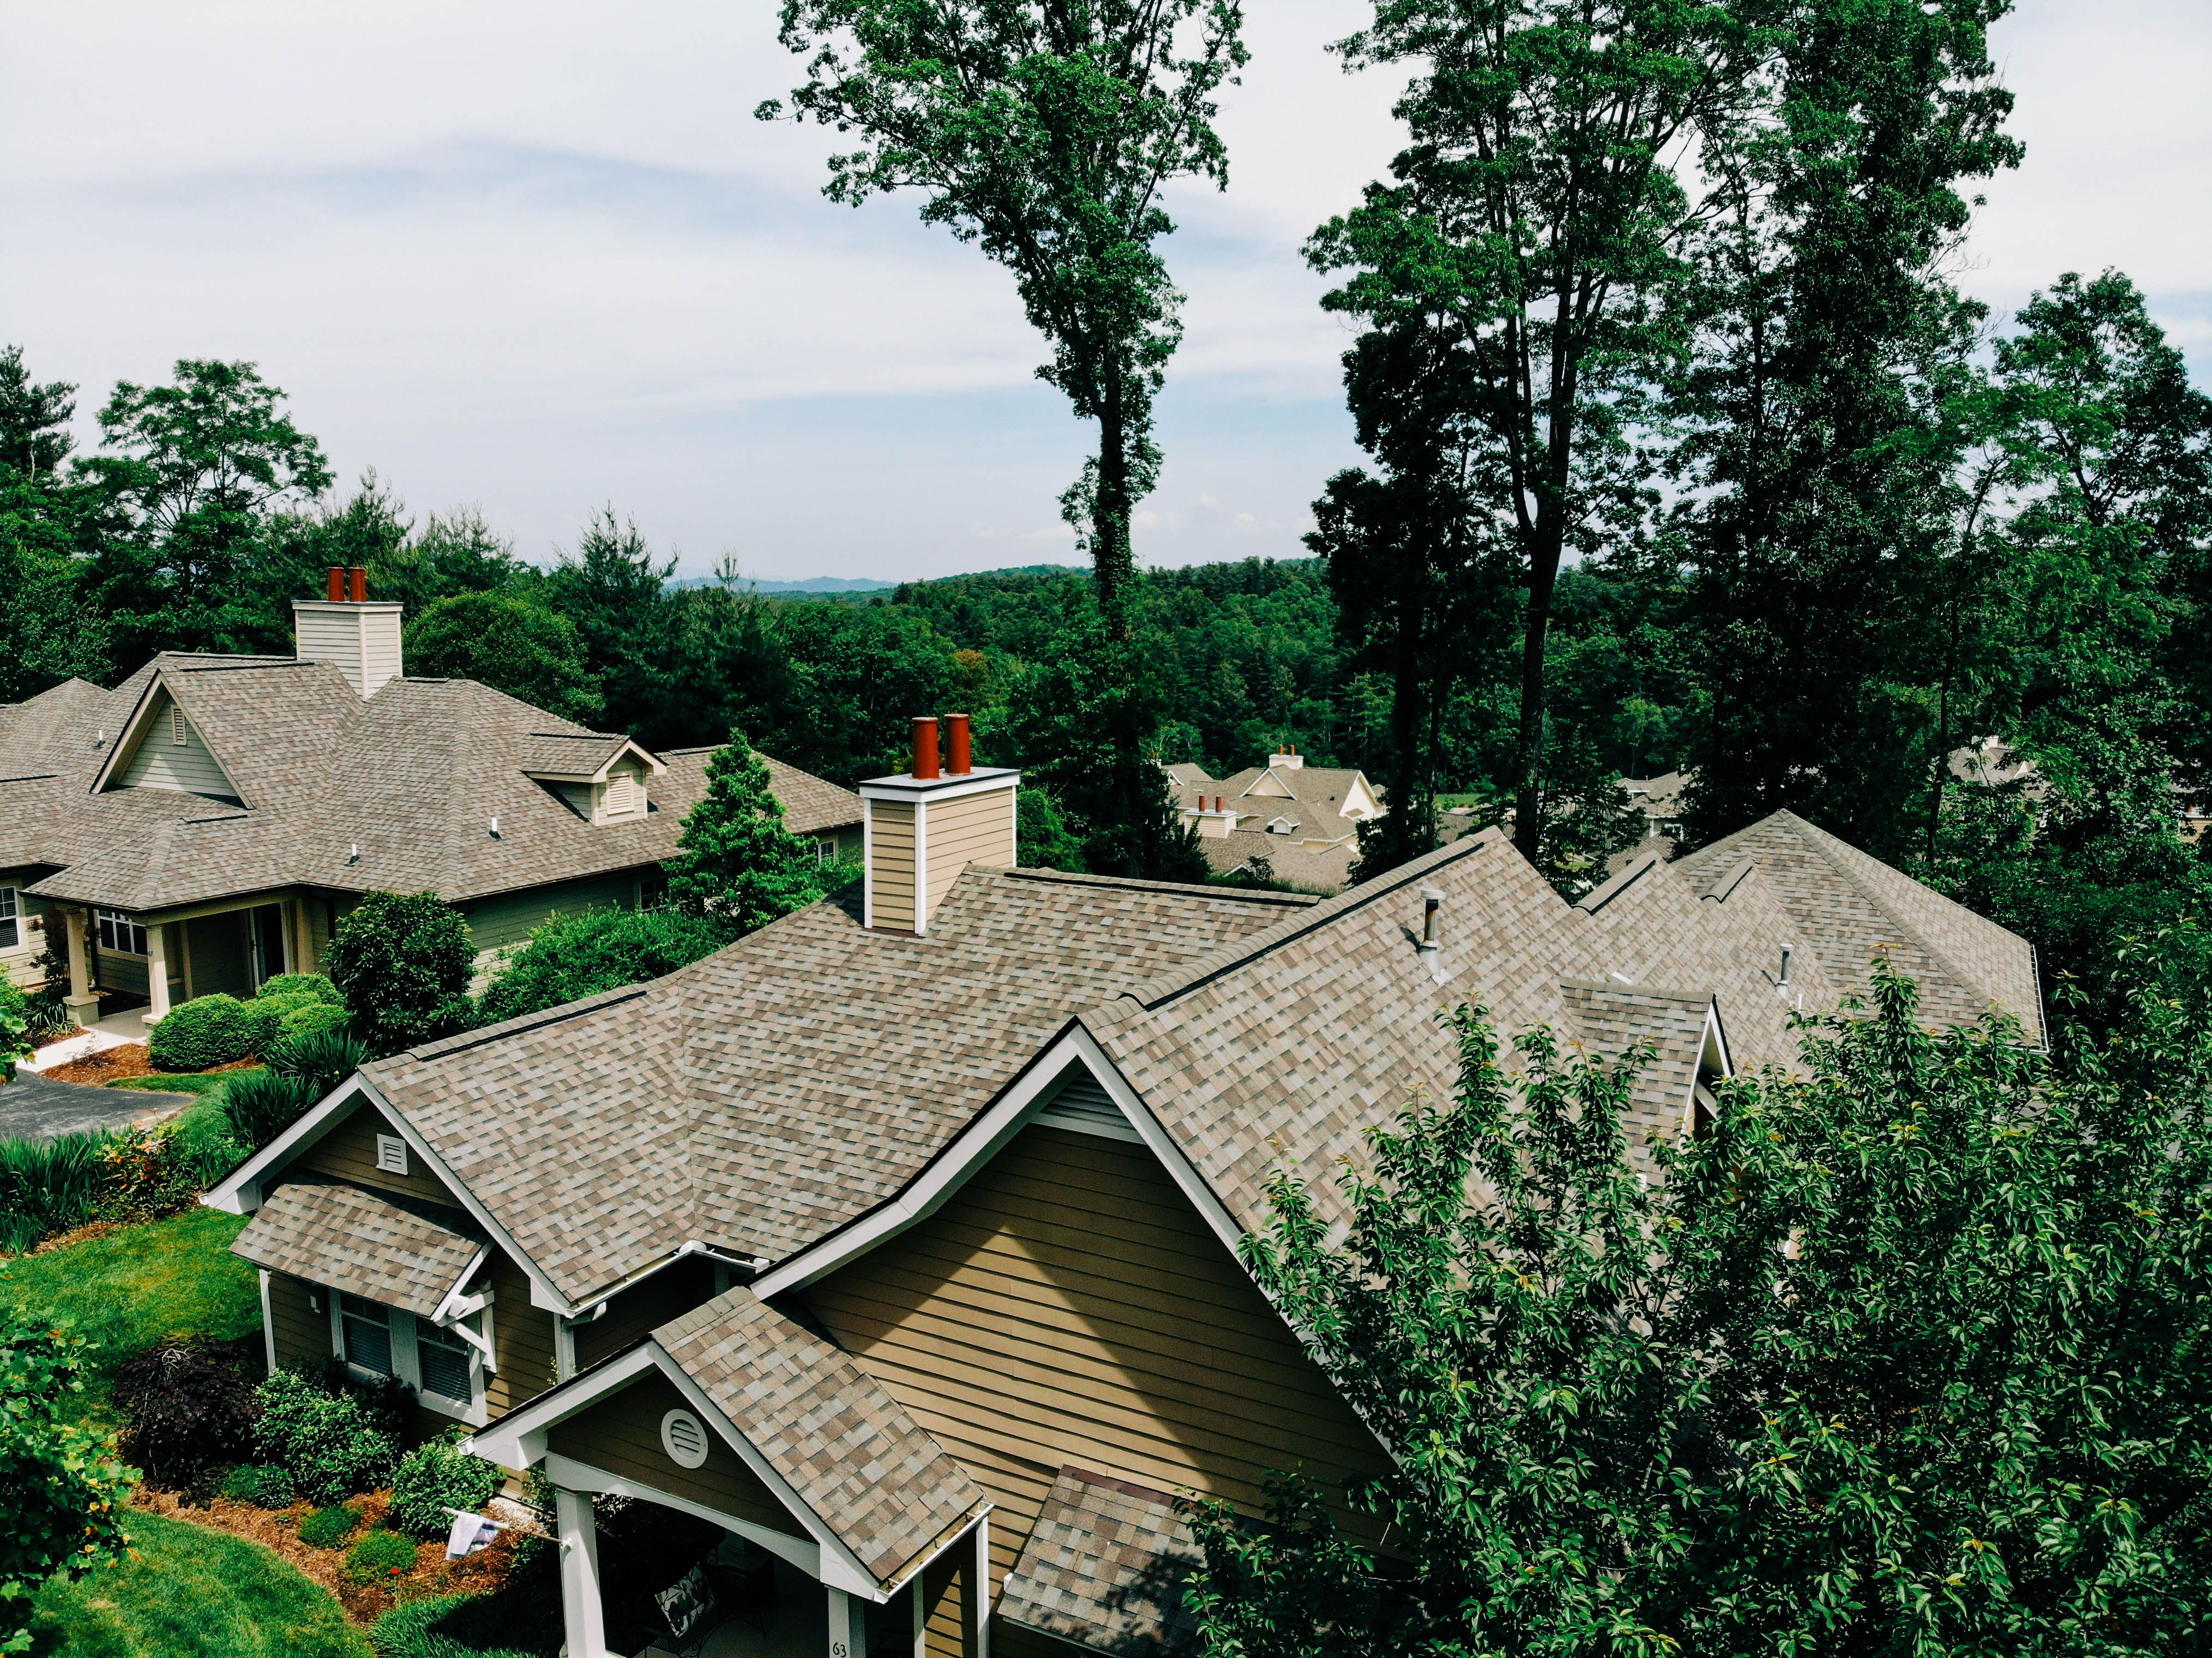 Tan Shingle Roof In 2020 Roof Shingles House Styles Shingling